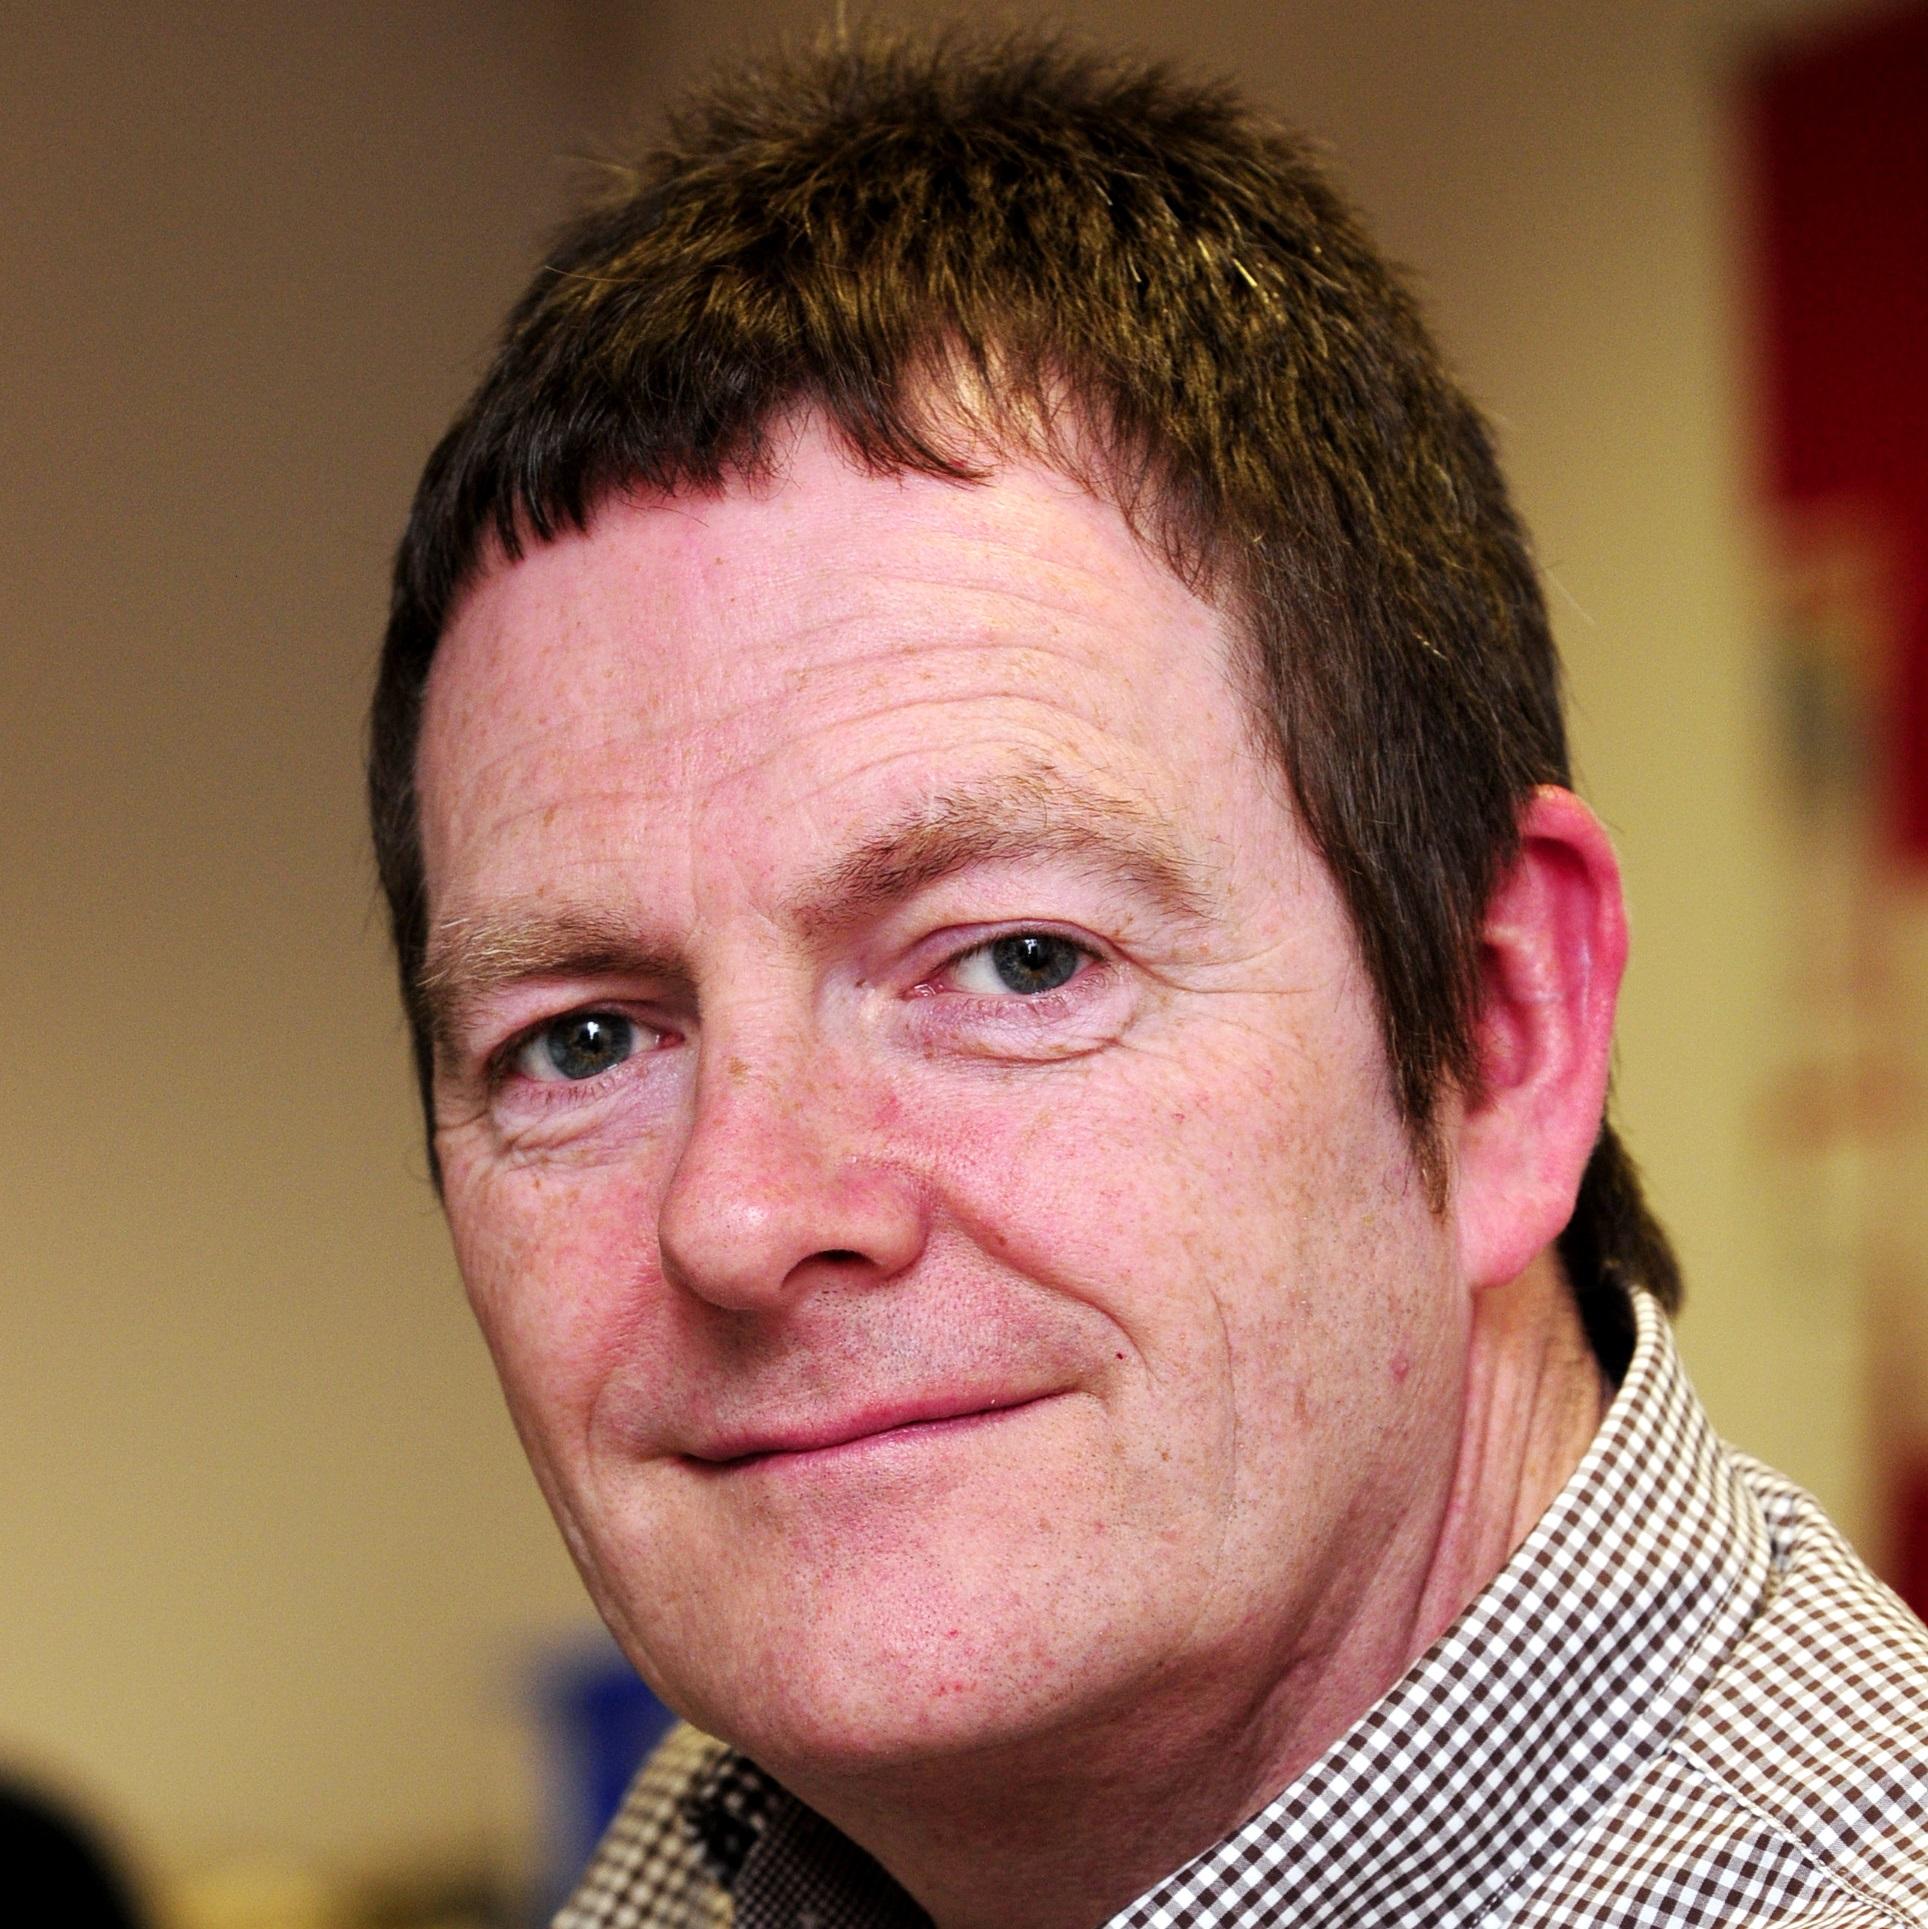 Profile: Craig Archer - 3701619